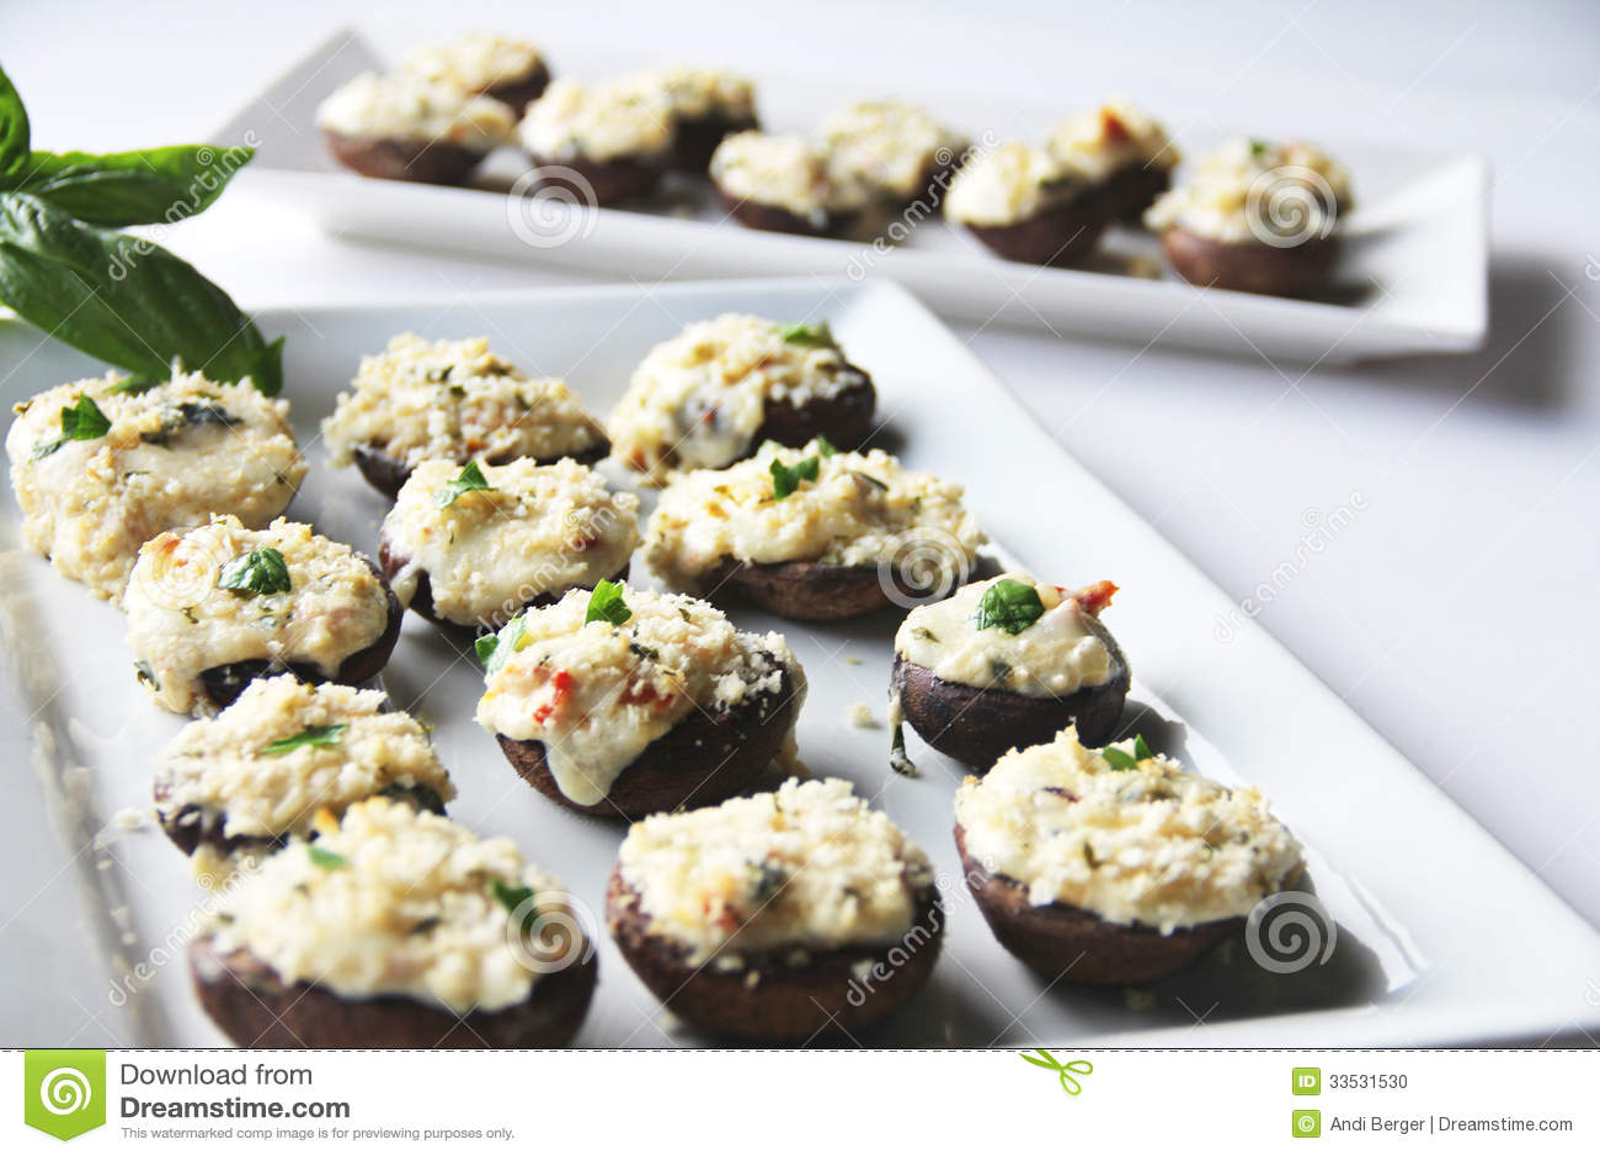 Stuffed Mushrooms Caprese Stock Photo - Image: 33531530